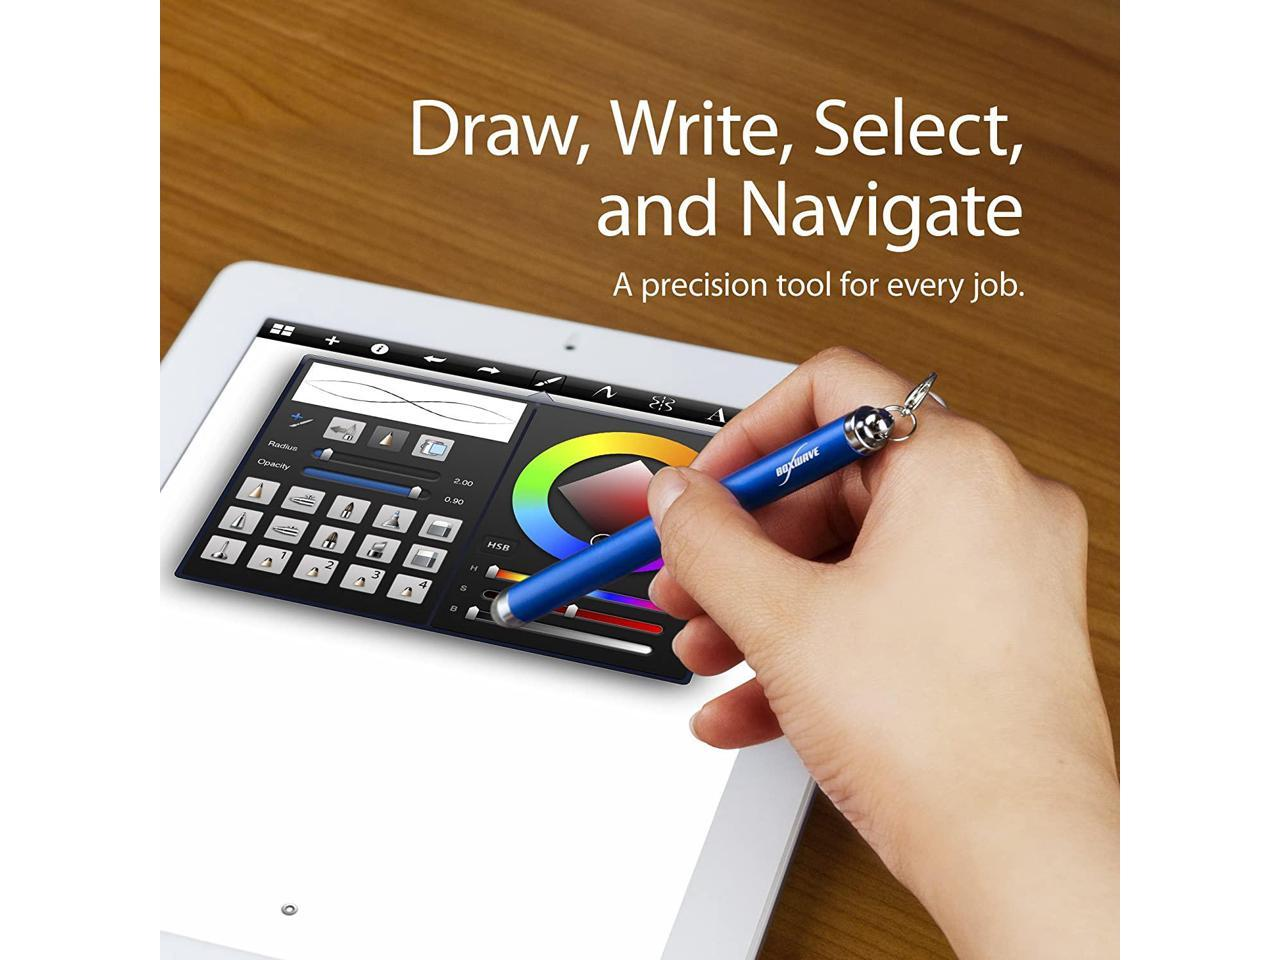 BoxWave Jet Black Fiber Tip Capacitive Stylus Pen for Bak USA Atlas EverTouch Capacitive Stylus Bak USA Atlas Stylus Pen